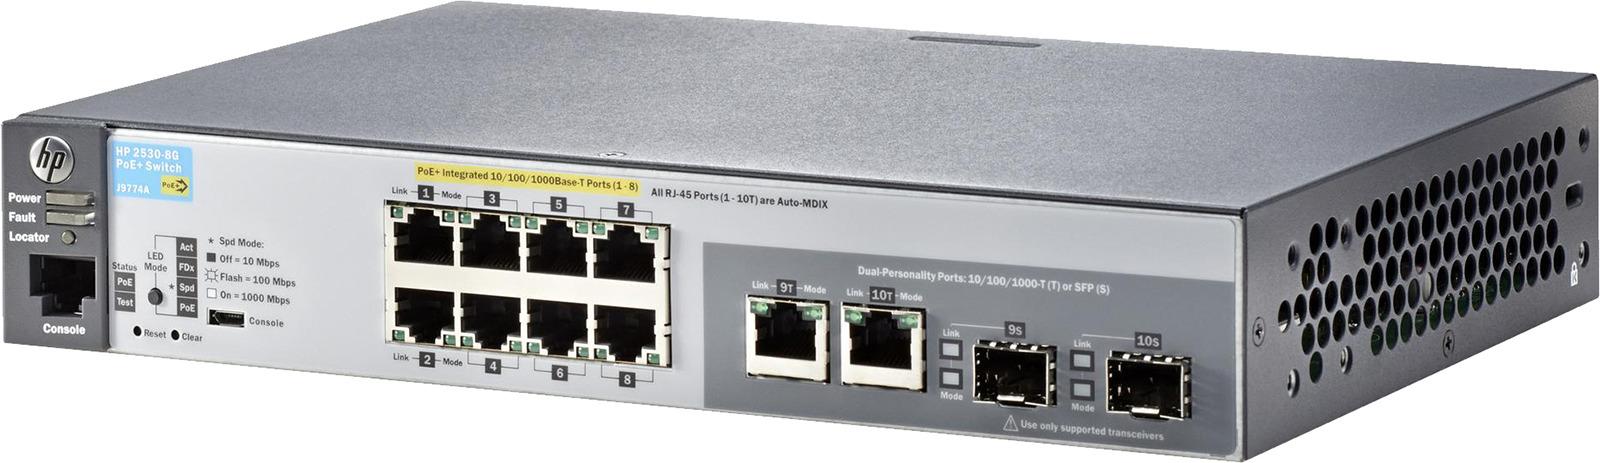 Коммутатор HPE 2530, управляемый, J9774A коммутатор hpe aruba 2530 j9774a